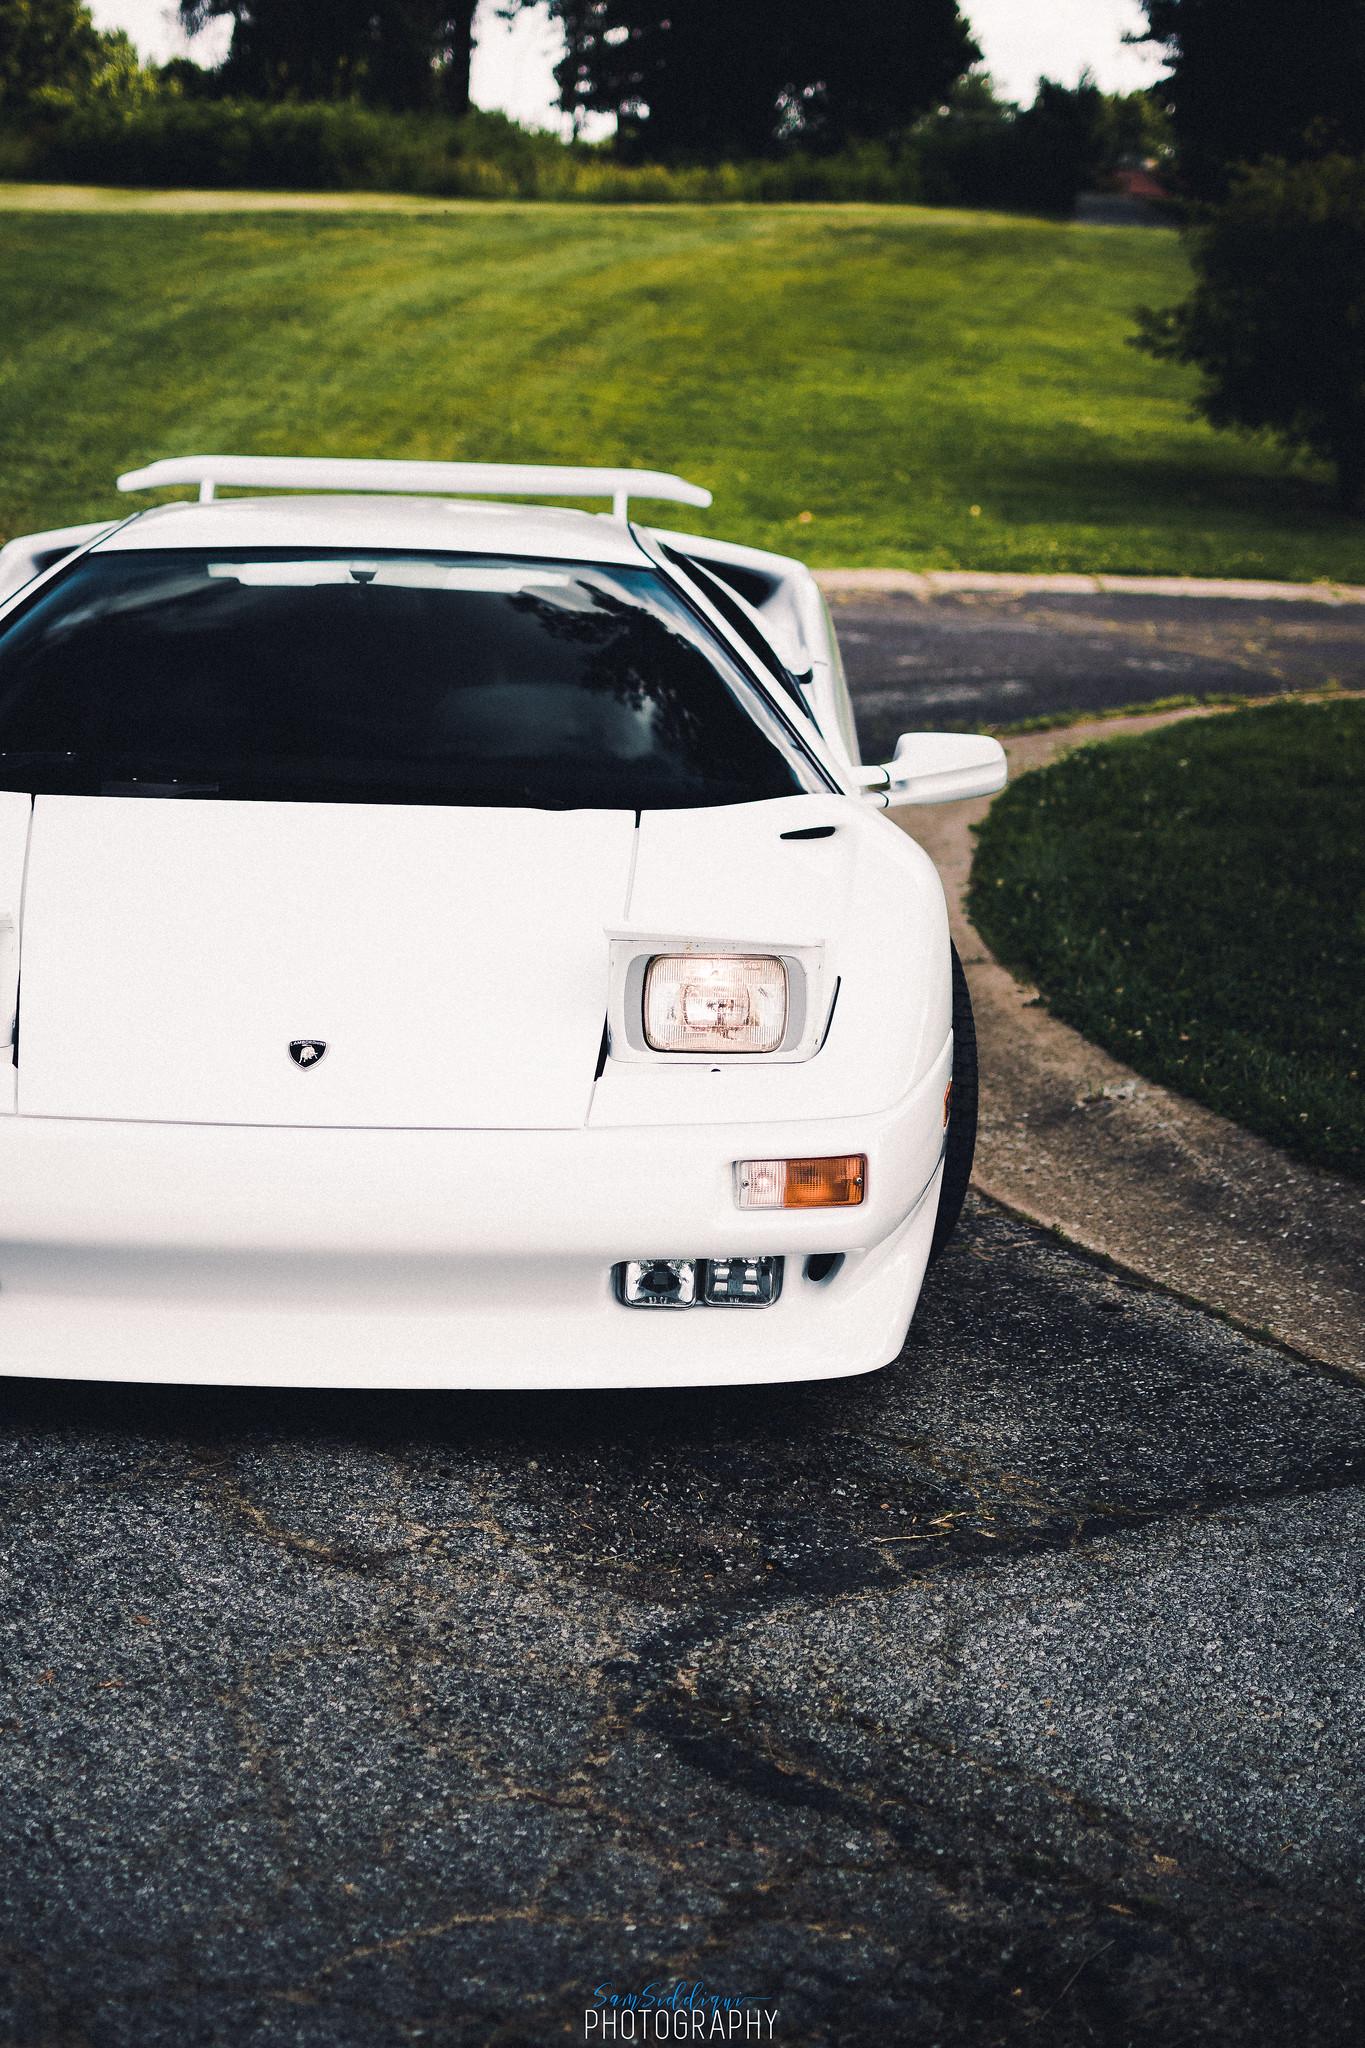 White Lamborghini Diablo Stl